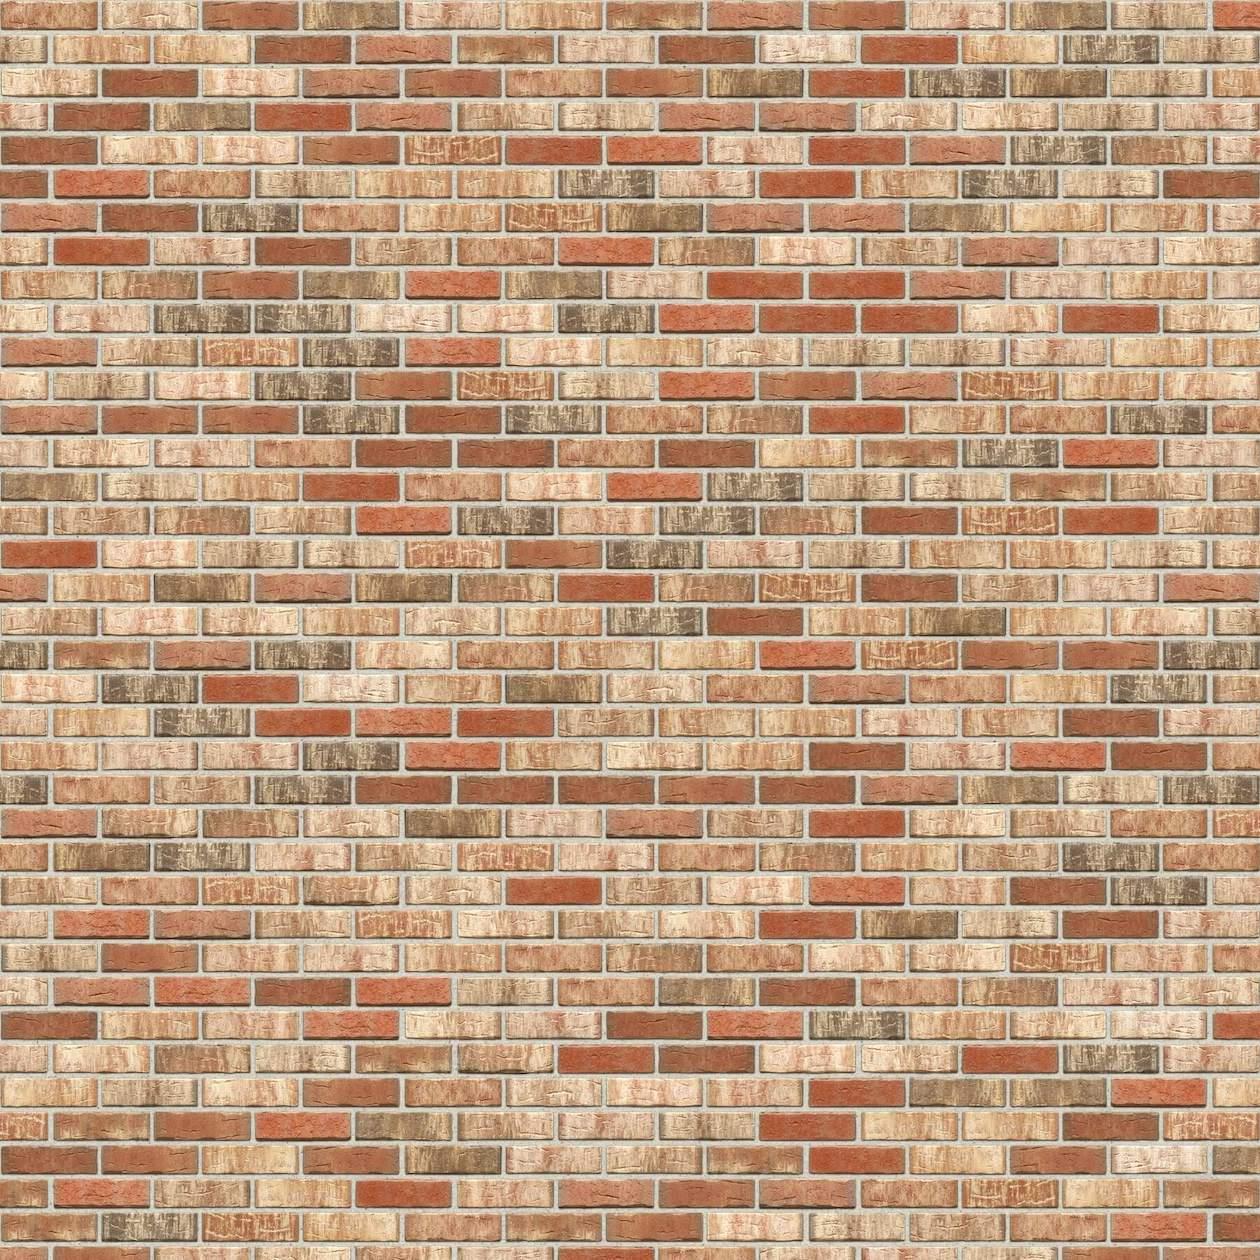 Puna-cigla-FeldHaus-Klinker-brick-house-nf-k-690-Bela Fuga